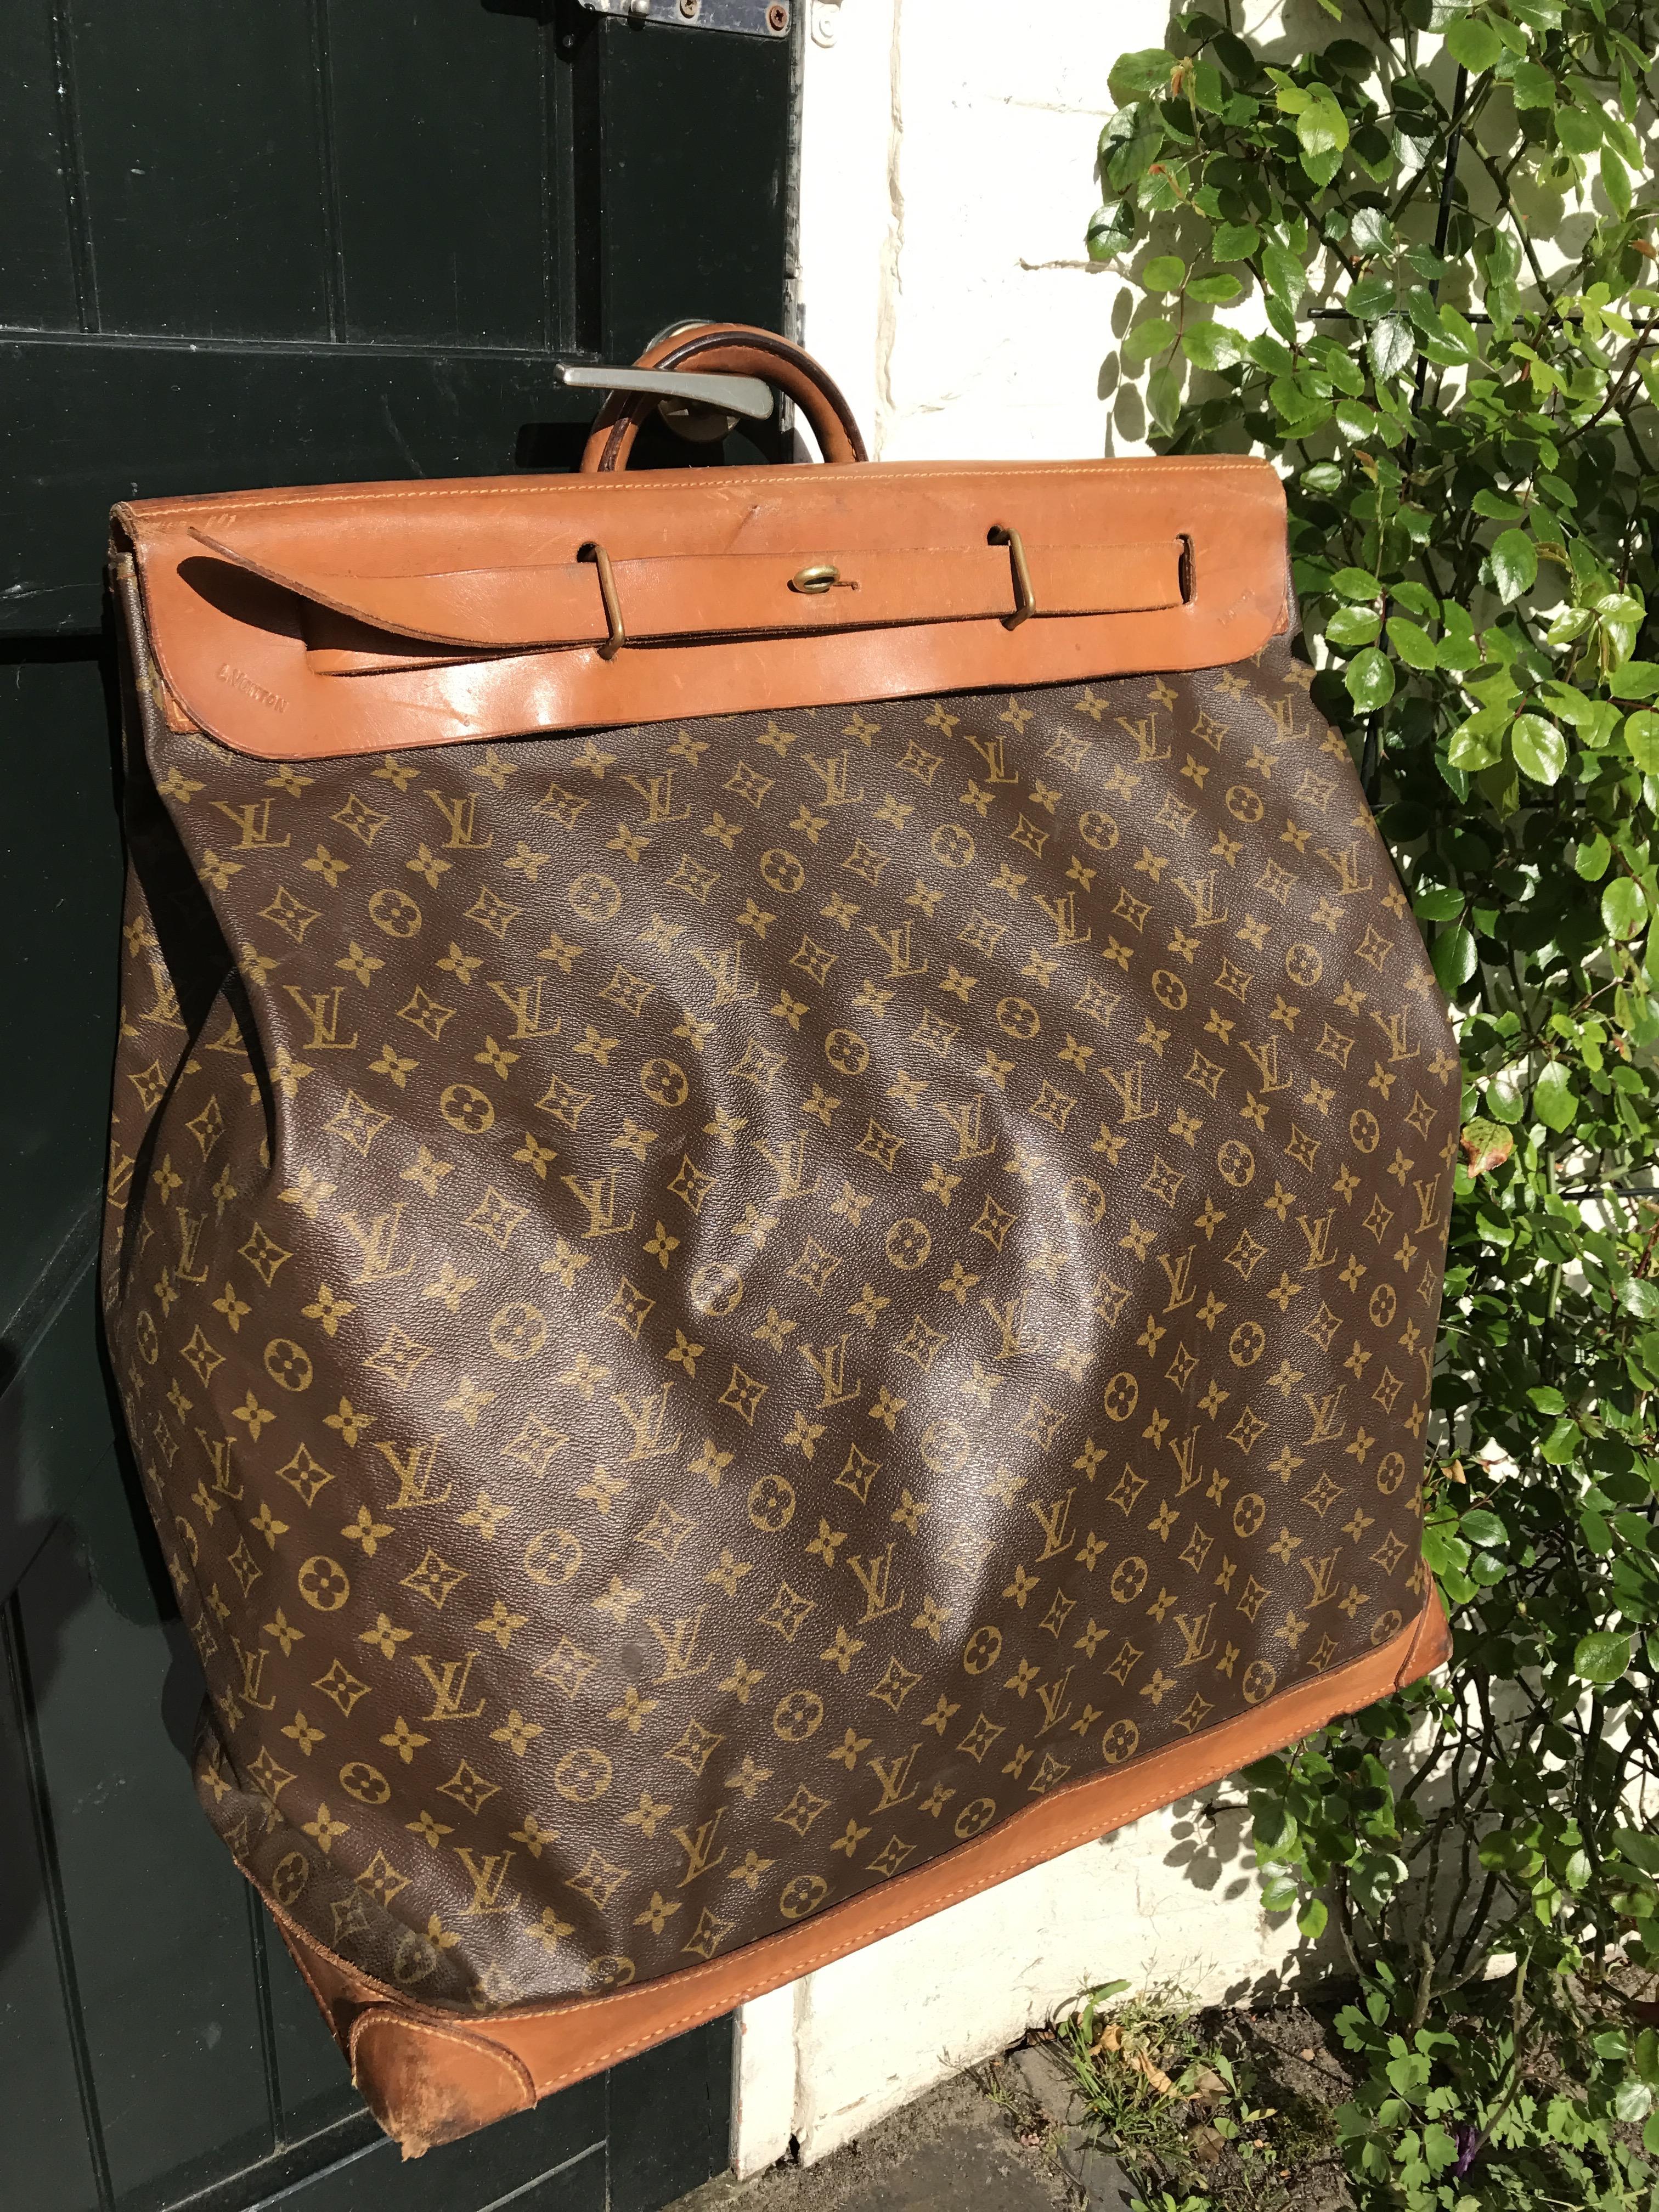 ce520f1c7efd Vintage Louis Vuitton steamer bag - Pinth Vintage Luggage